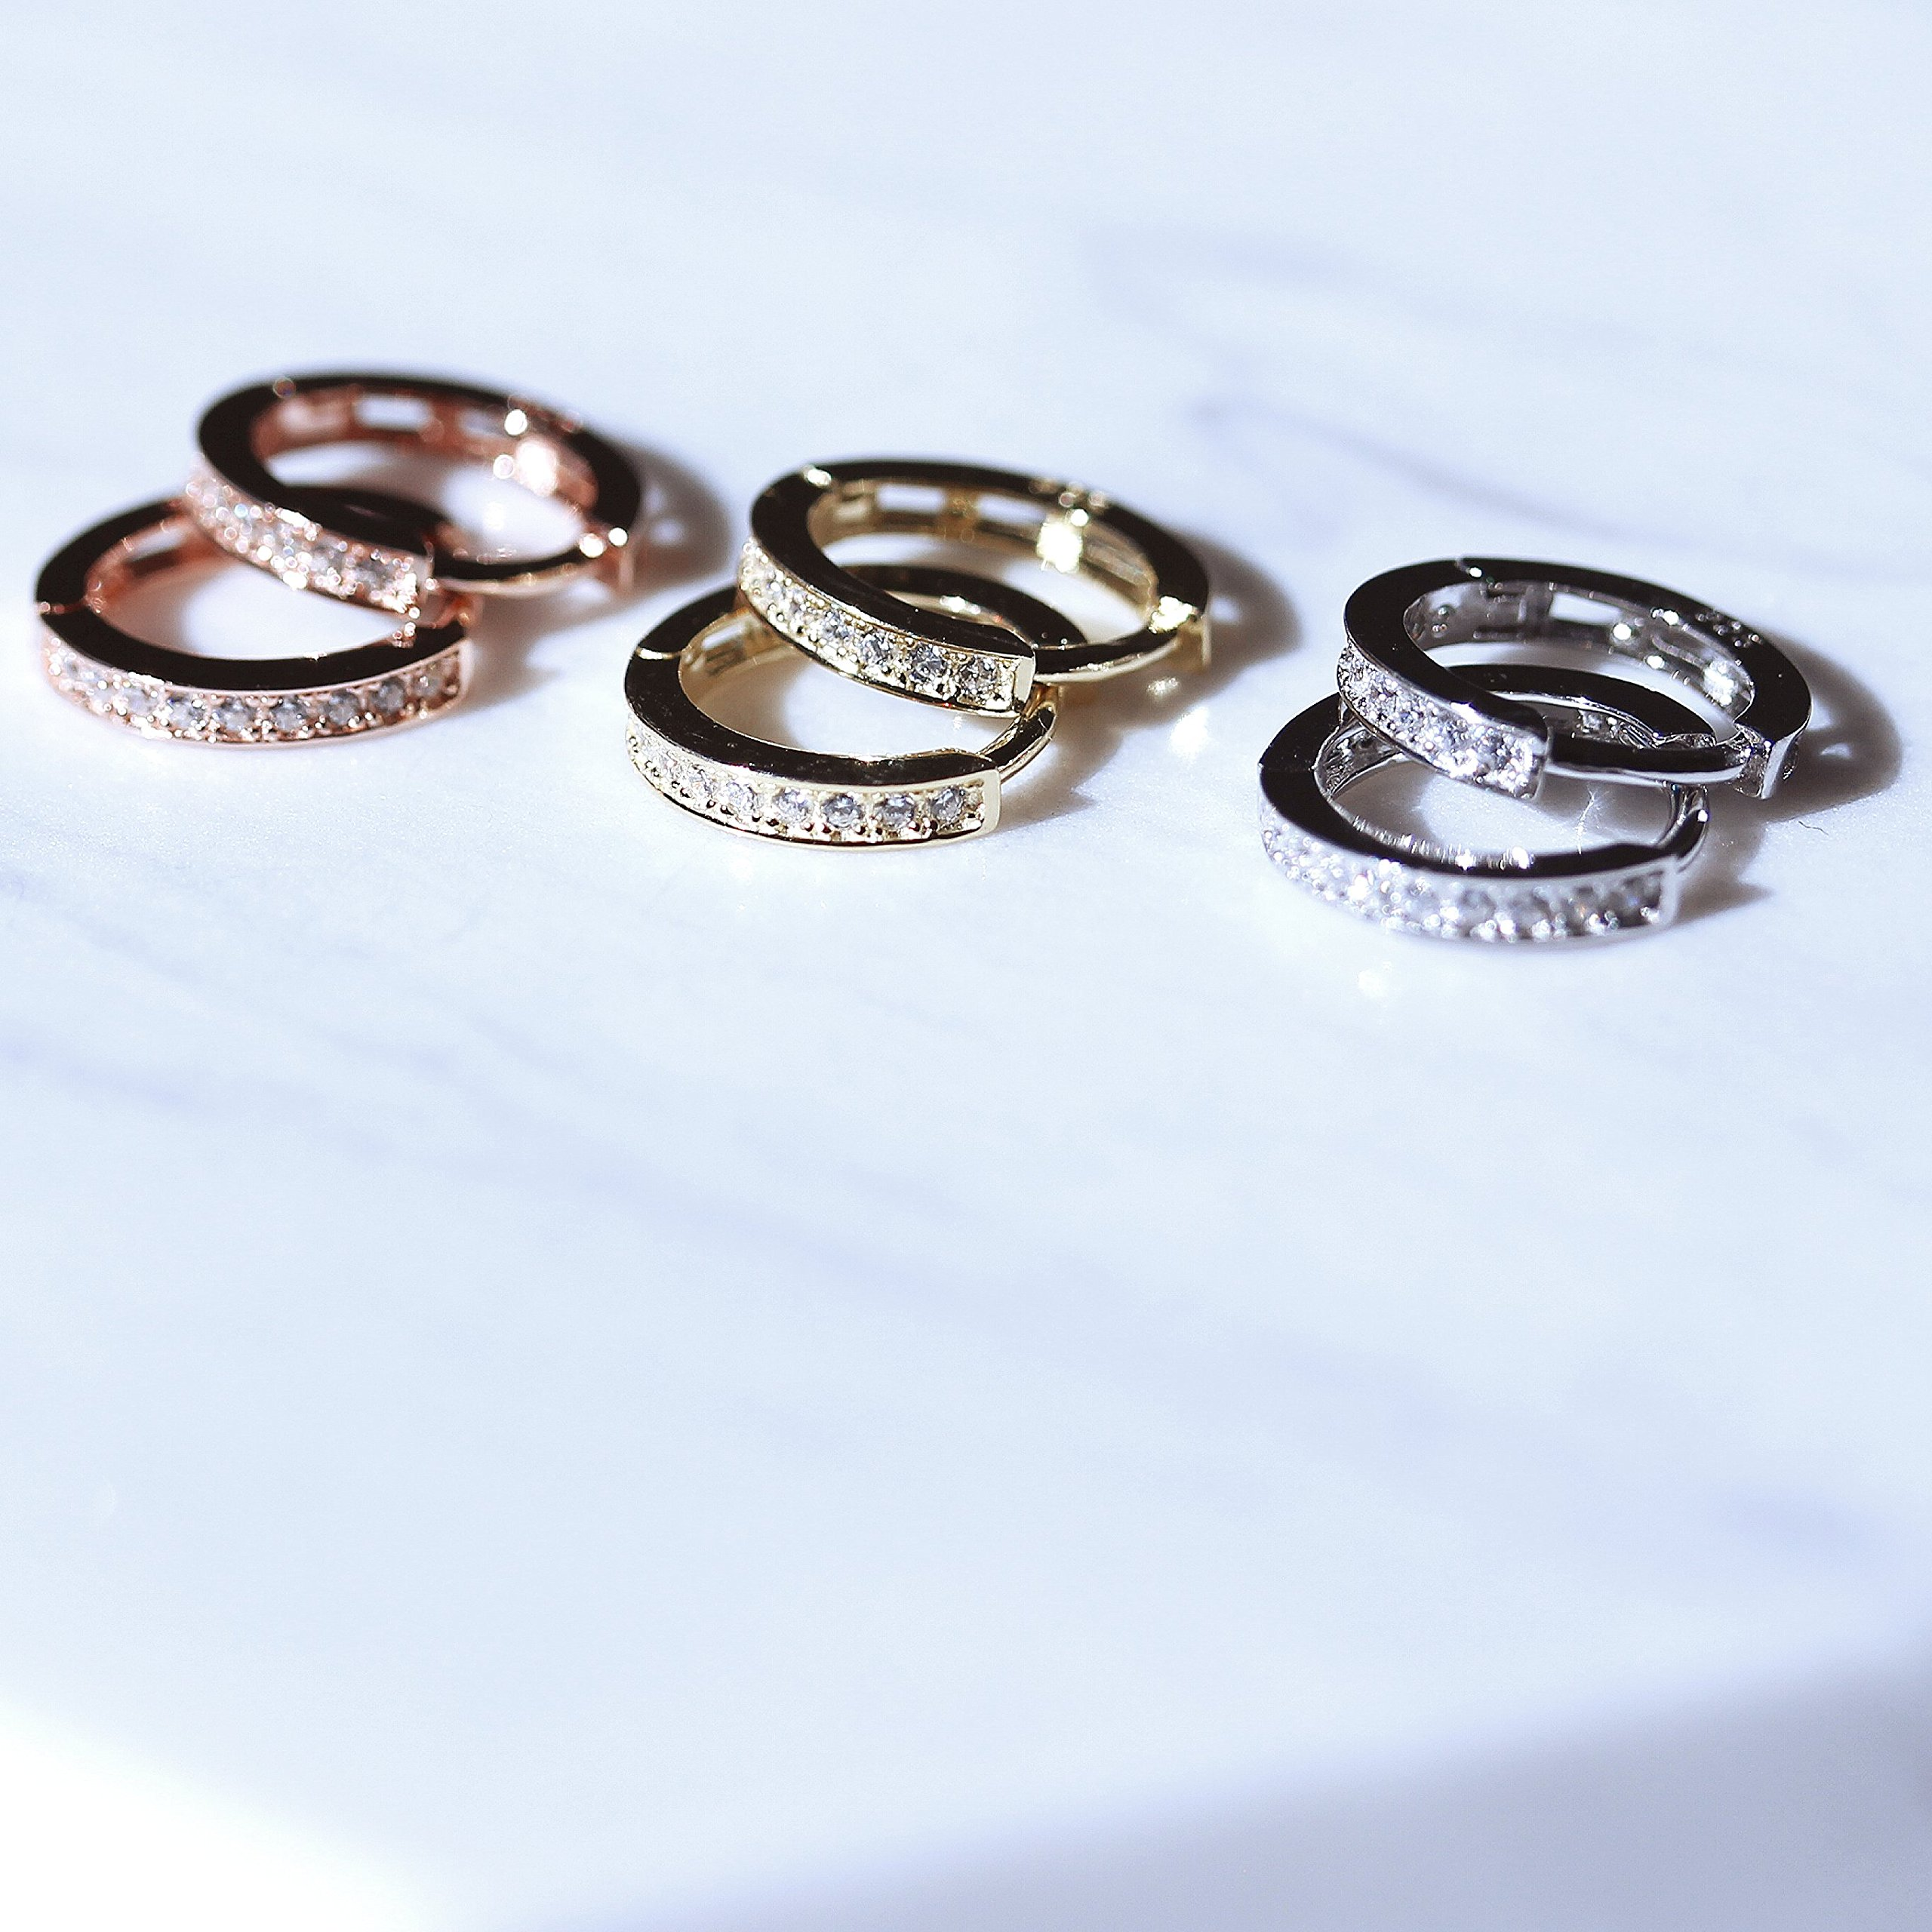 Yellow Gold Plated Sterling Silver Cubic Zirconia Huggie Hoop Earrings by Spoil Cupid (Image #2)